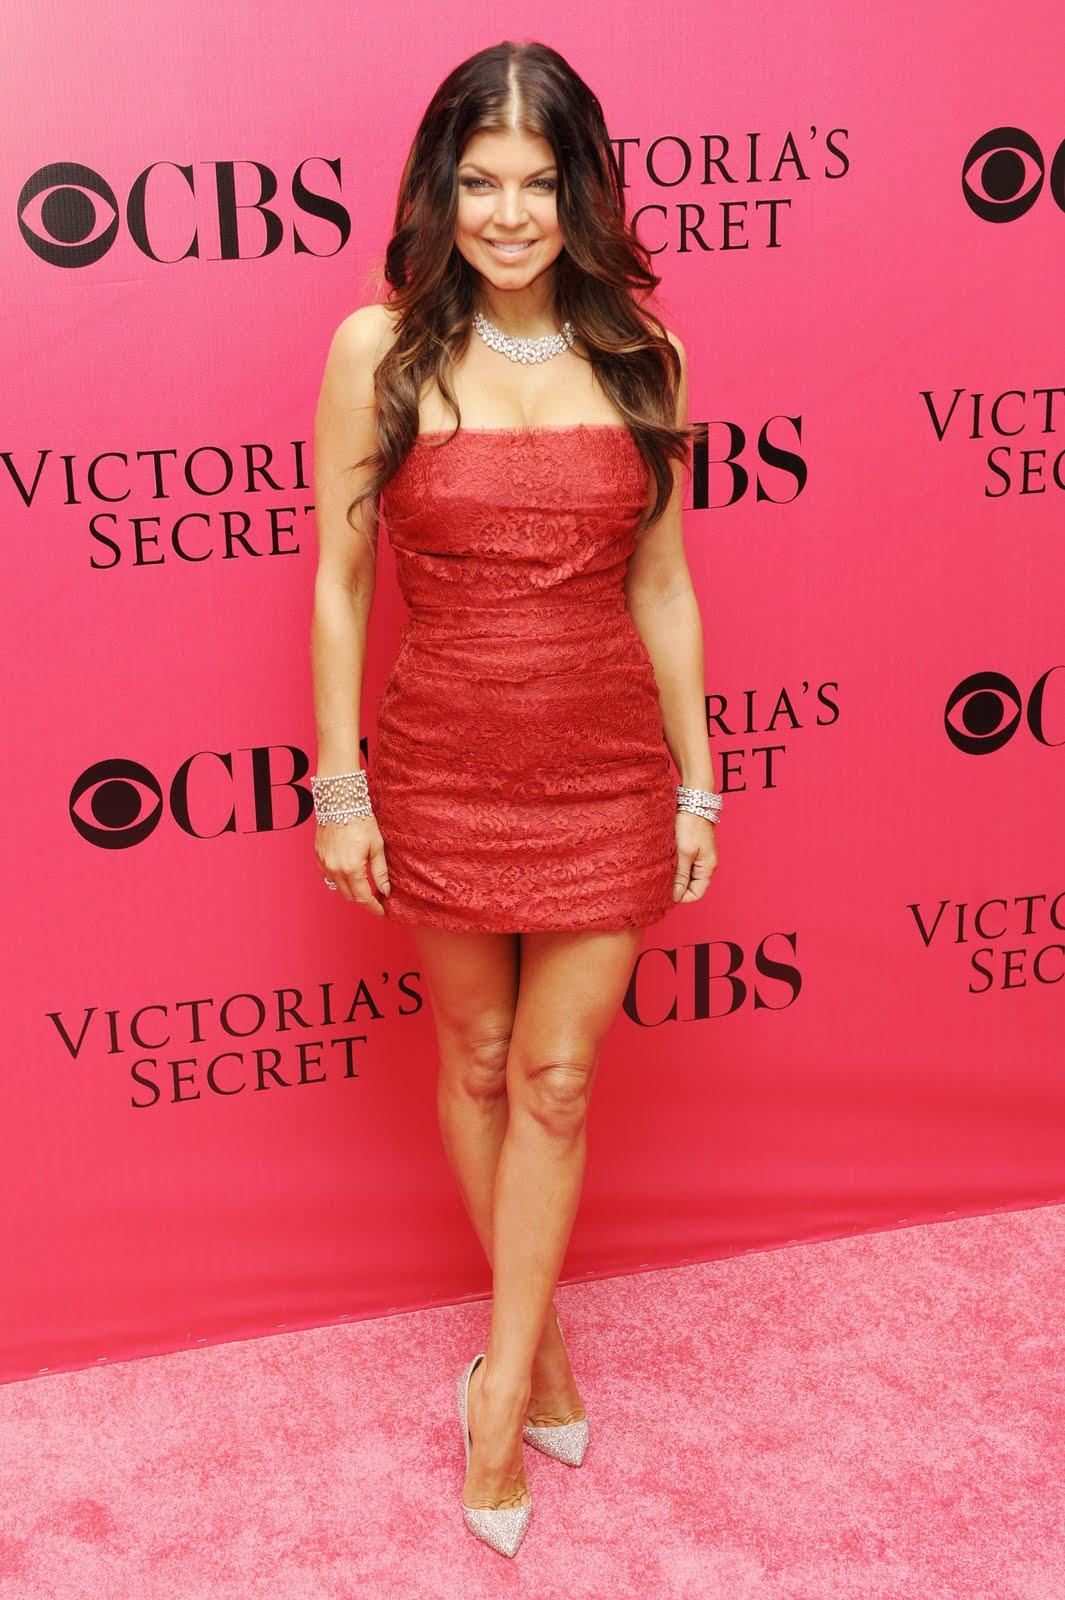 http://4.bp.blogspot.com/_Vd81jOiVjoY/Sw2UM6FhC0I/AAAAAAAAKtM/N4mSWHckevI/s1600/65255_Stacy_Ferguson_Victorias_Secret_Show_in_NY_November_19_2009_10_122_827lo.jpg